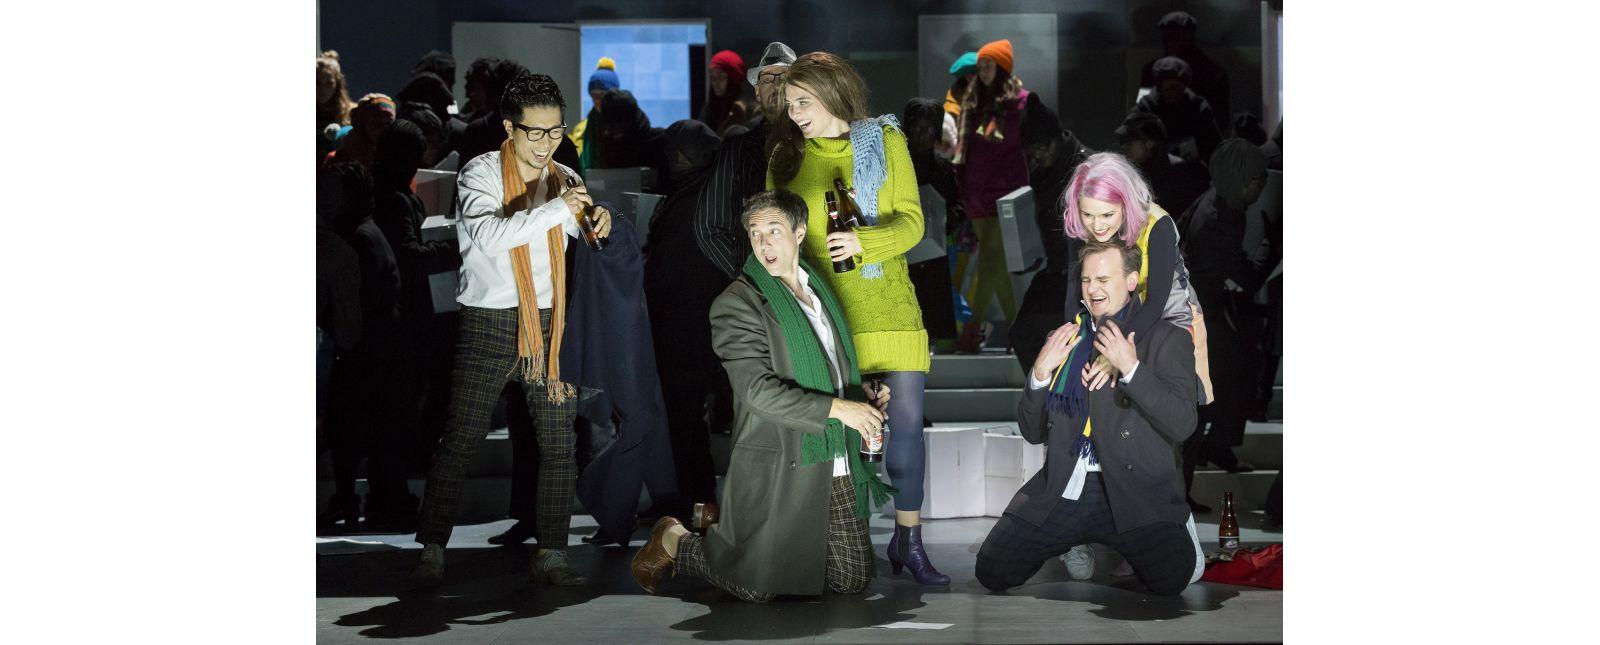 La Bohème // Jin Seok Lee // Harold Meers // Solen Mainguené // Michael Borth // Katharina Ruckgarber // Chor // 2018 // Rainer Muranyi